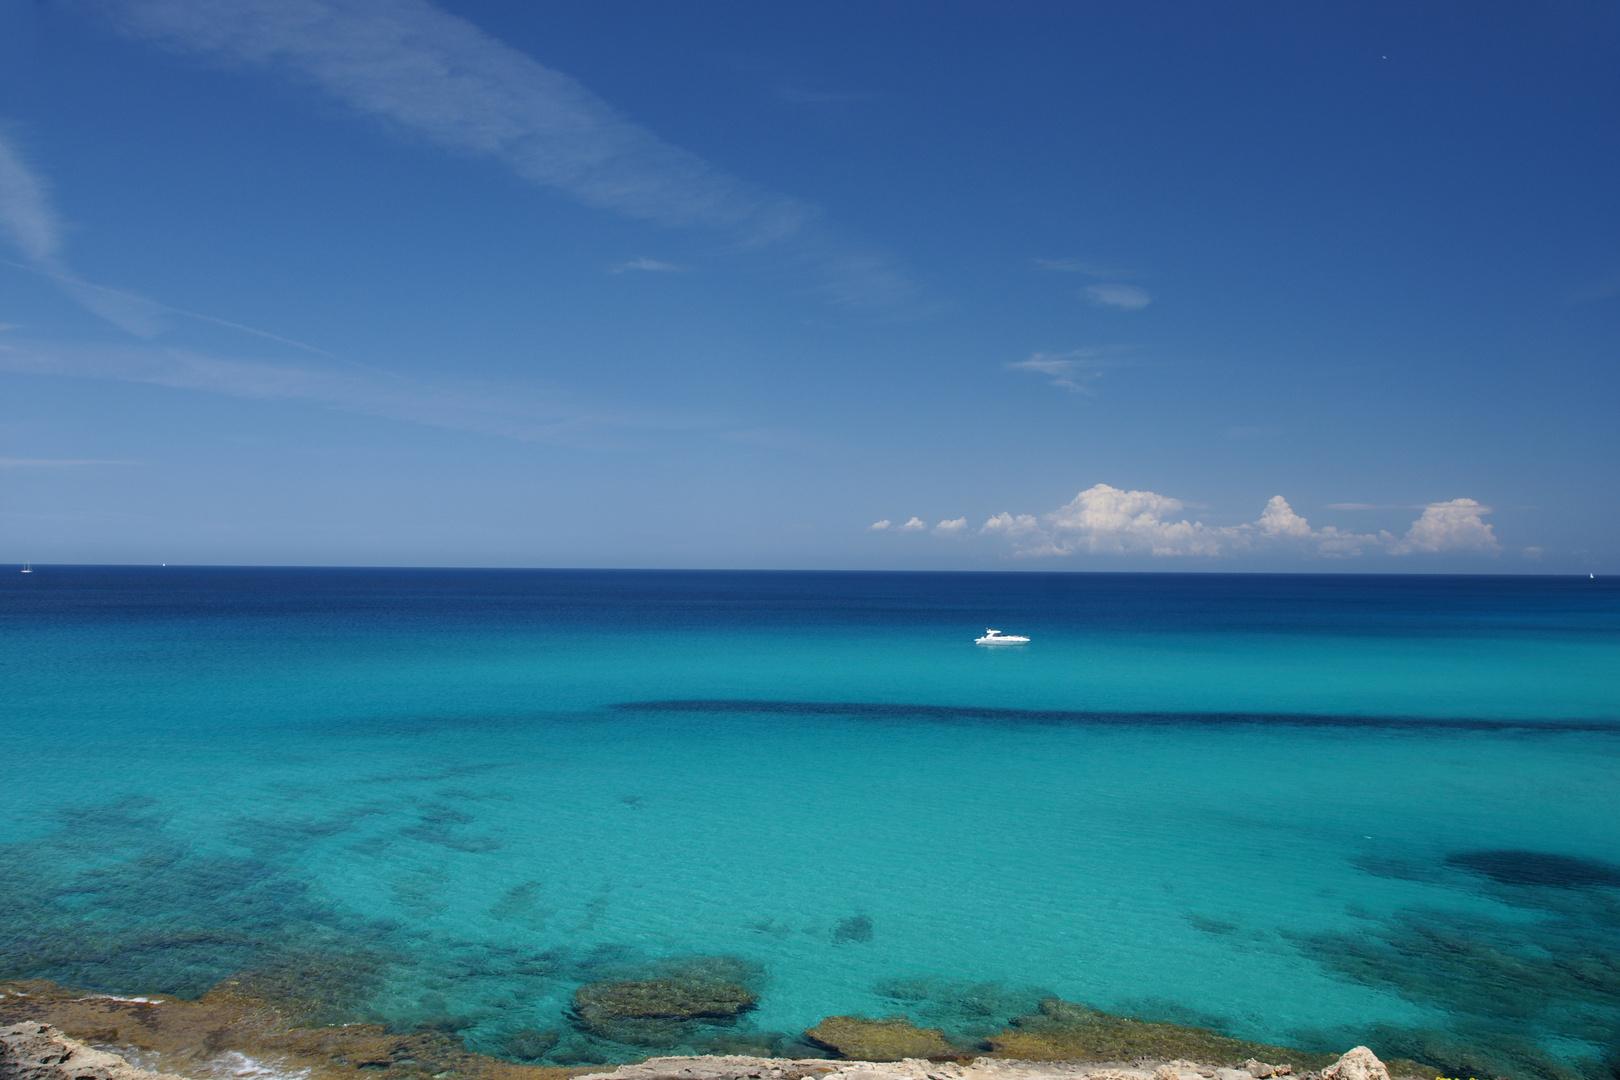 Bucht von Cala Mesquida / Mallorca